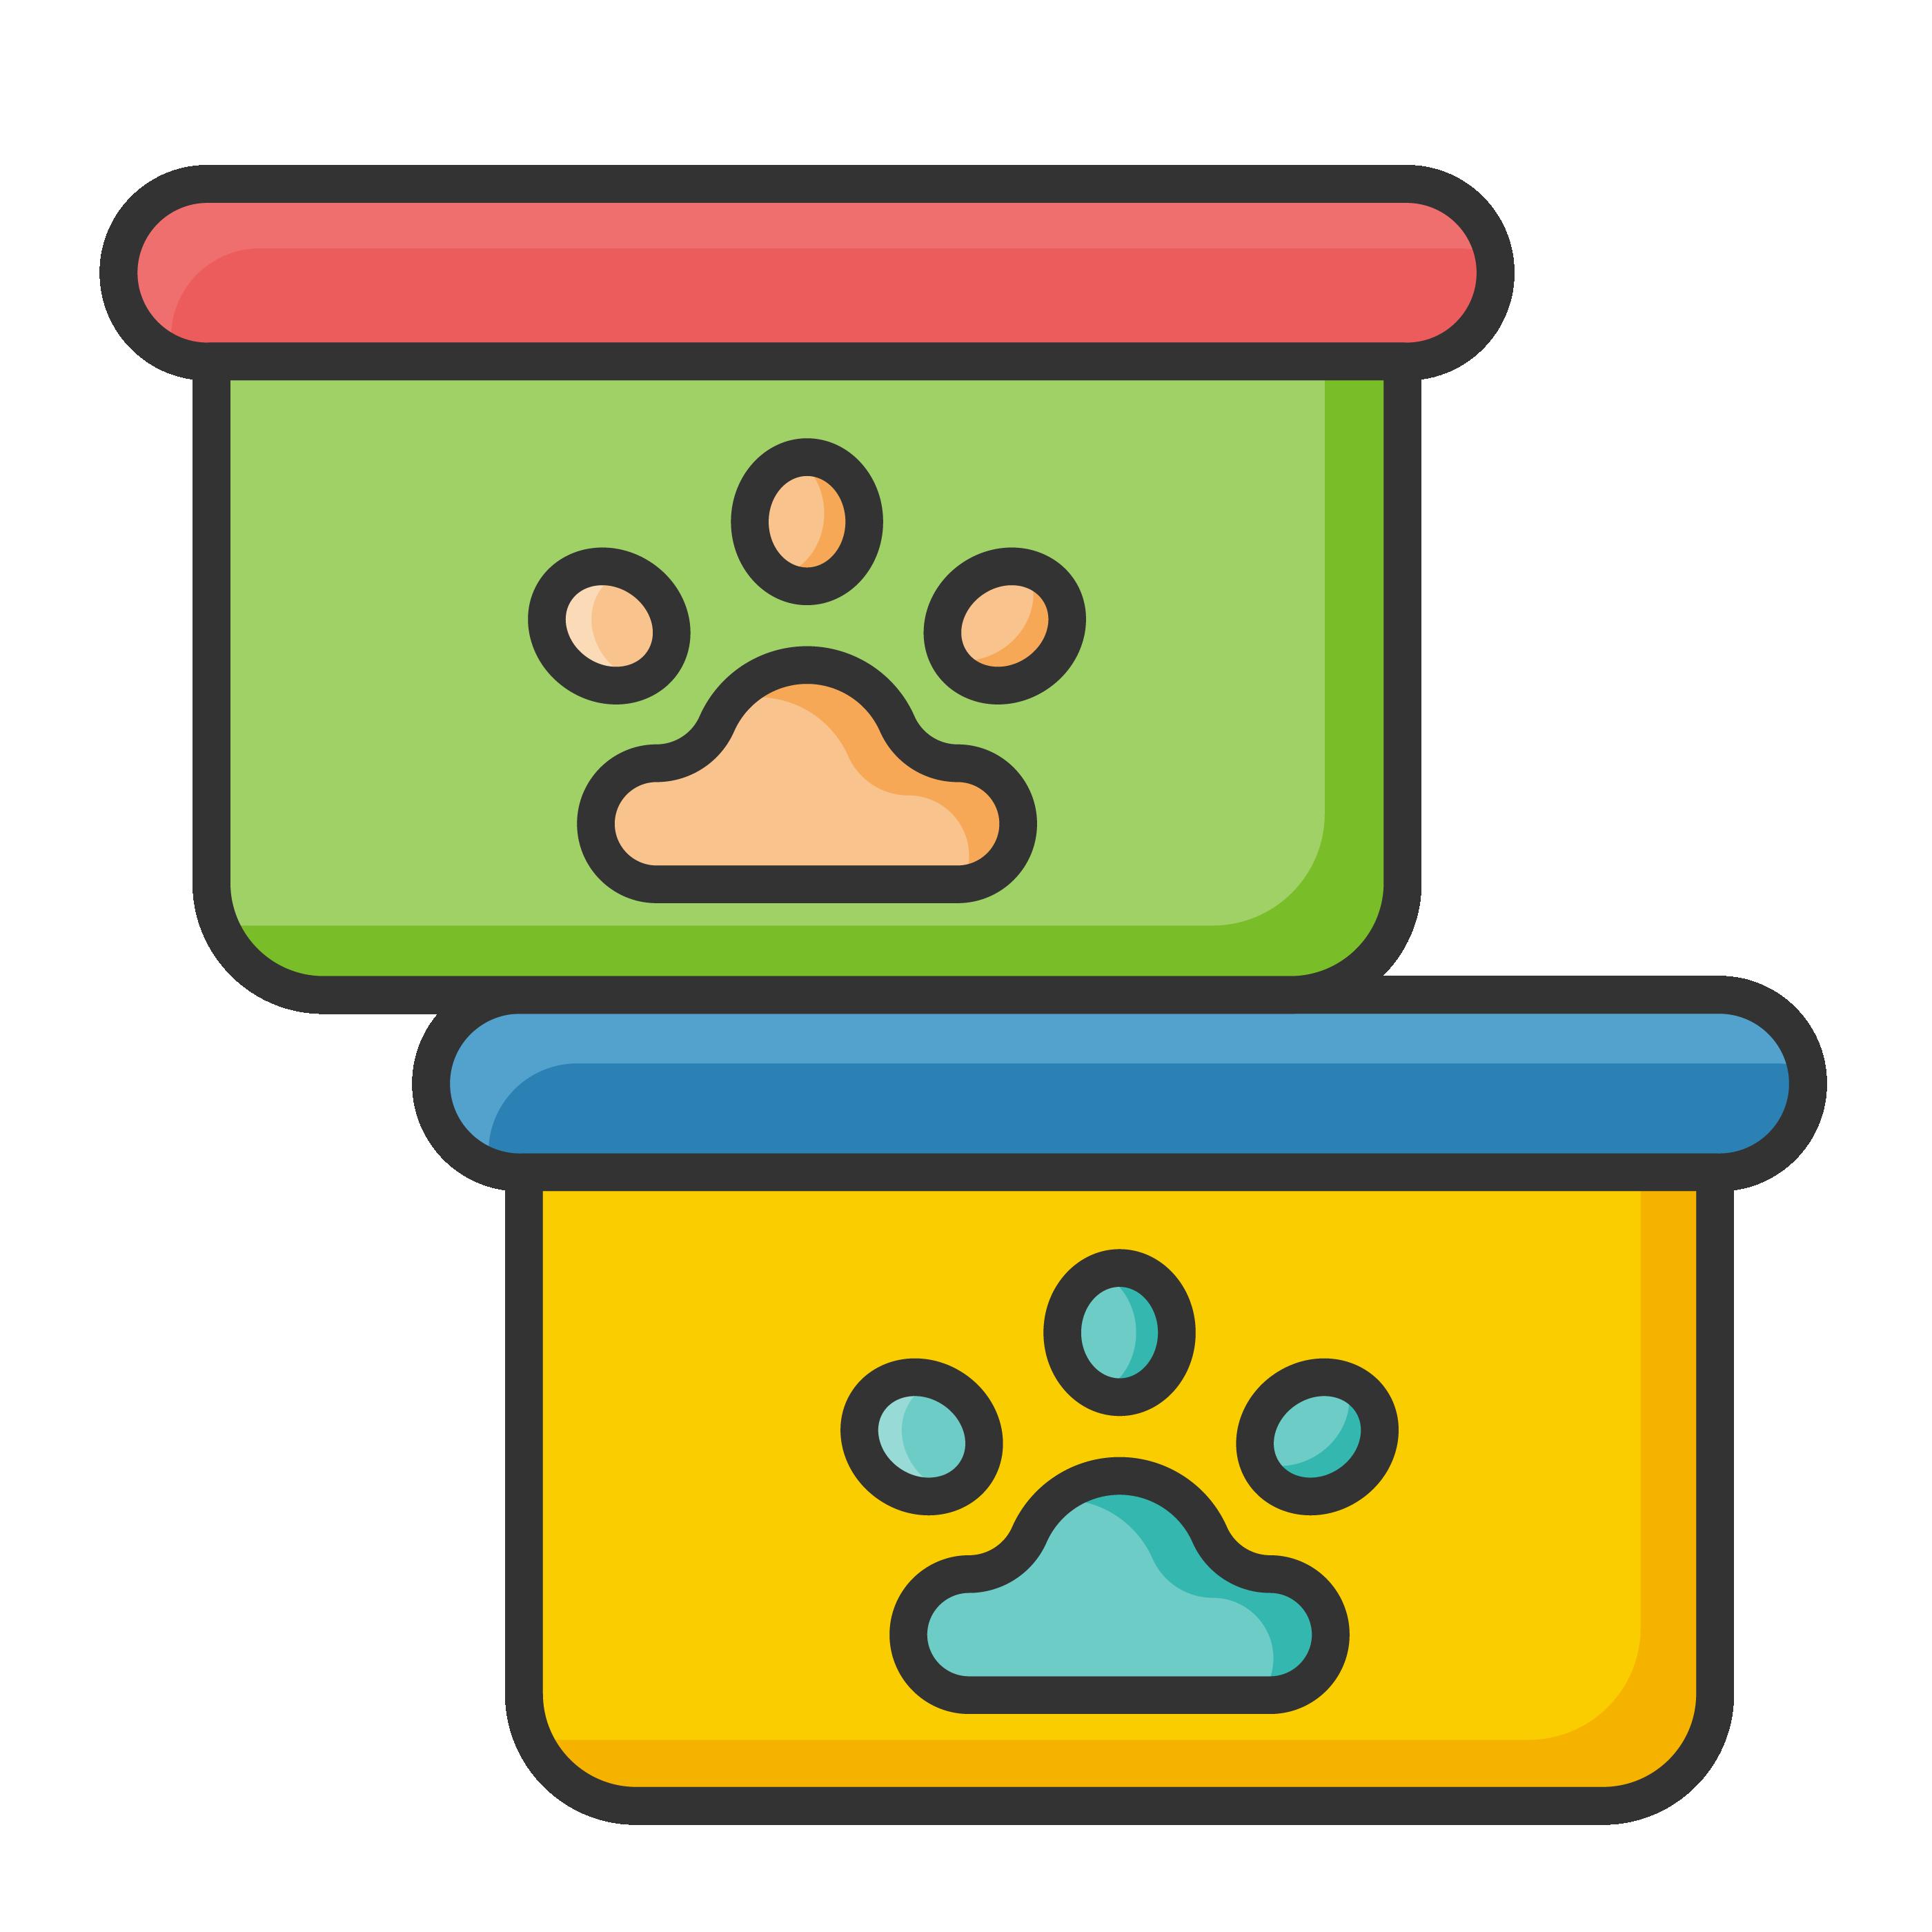 sp-neuter-icon